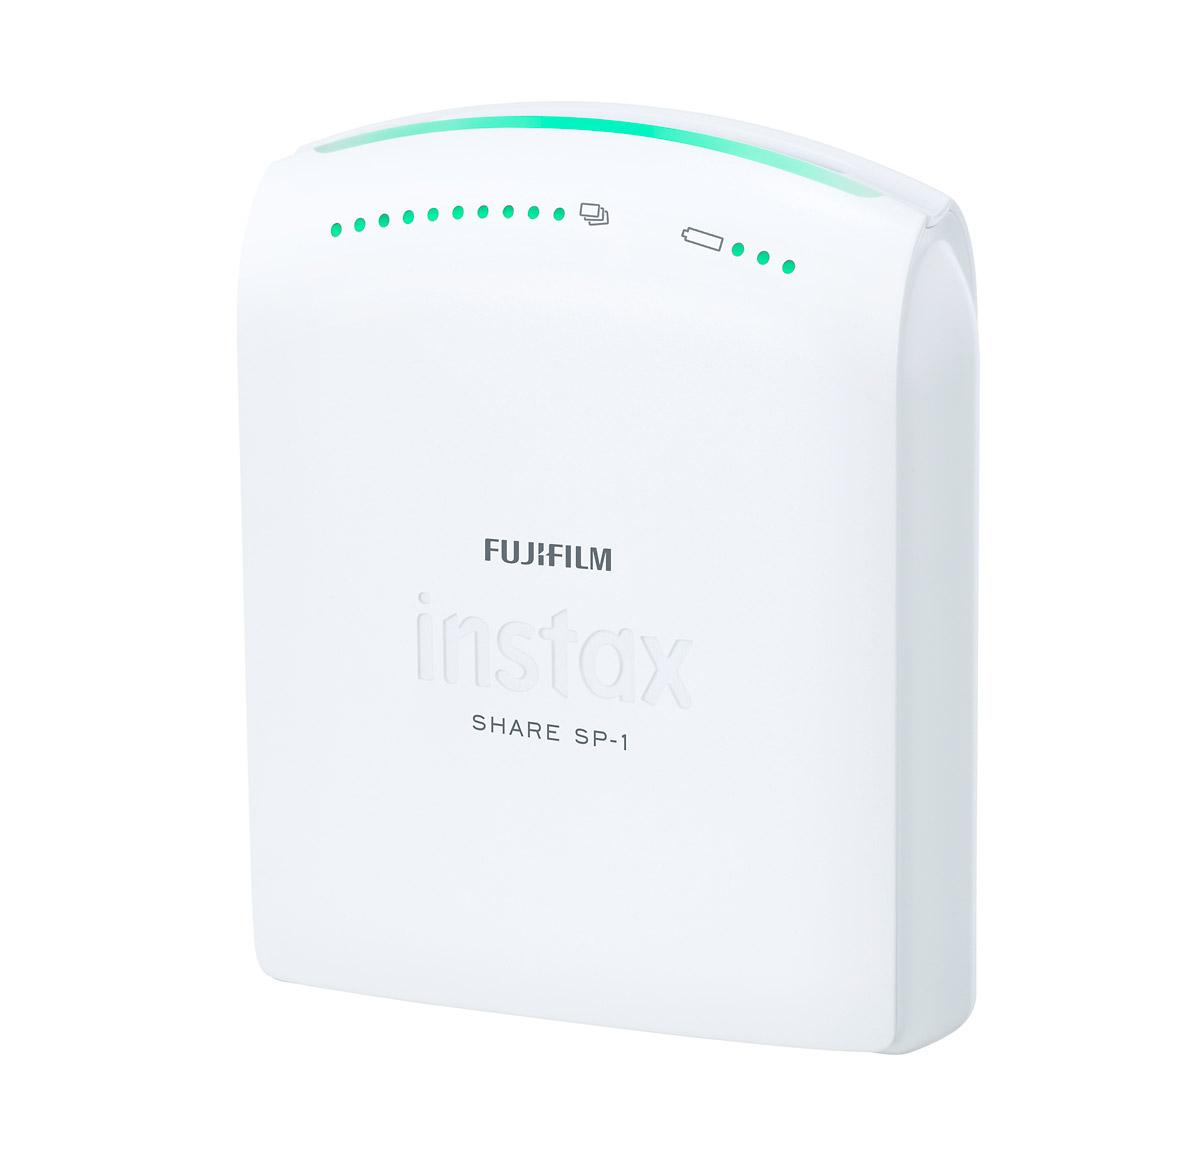 Fujifilm Instax Share SP-1 Wi-Fi Instant Printer